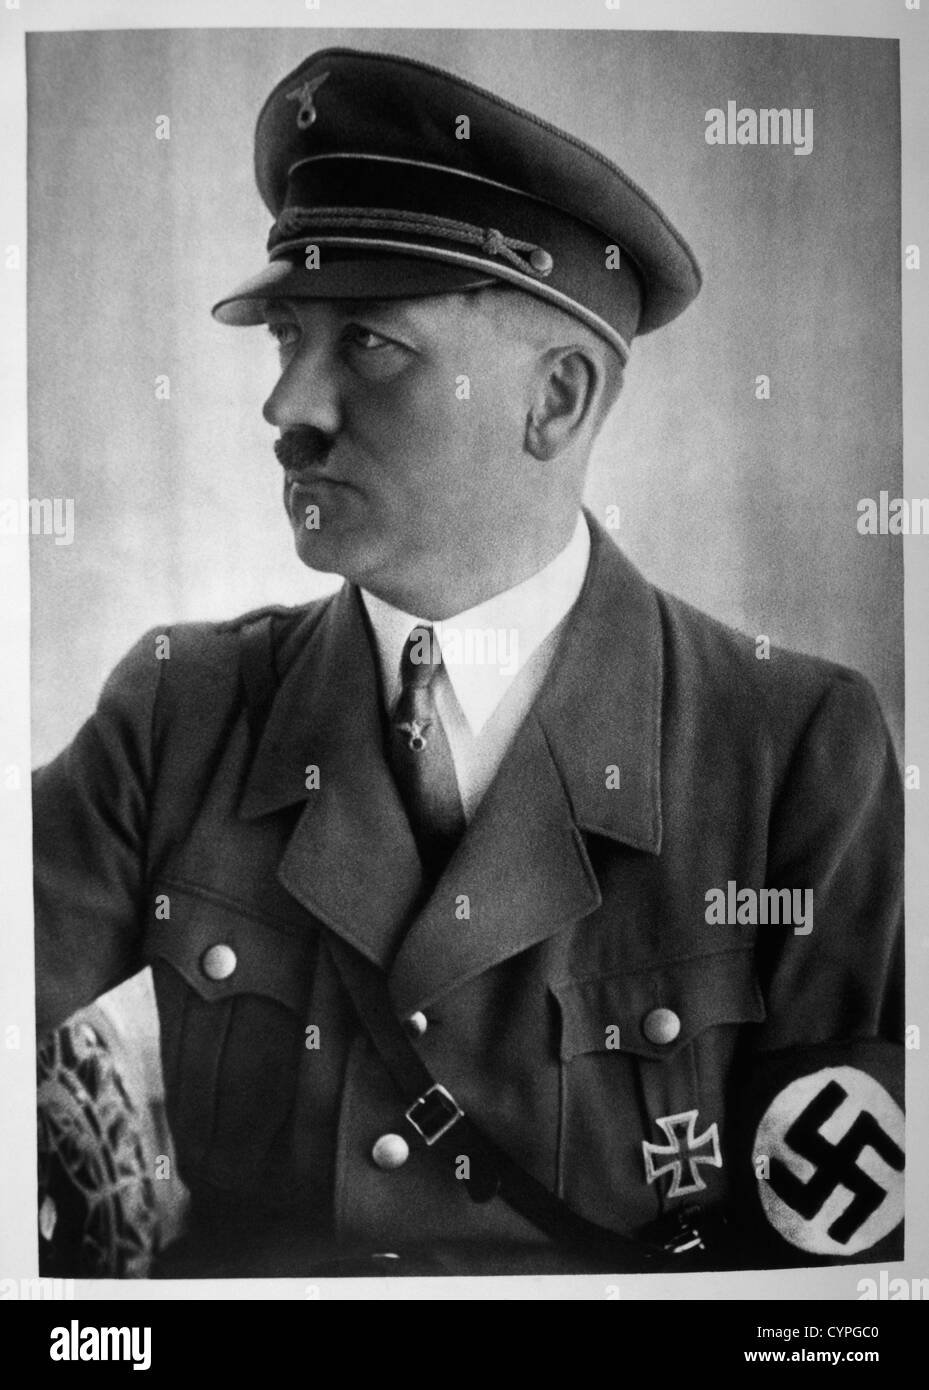 Adolf Hitler, Portrait, 1933 - Stock Image